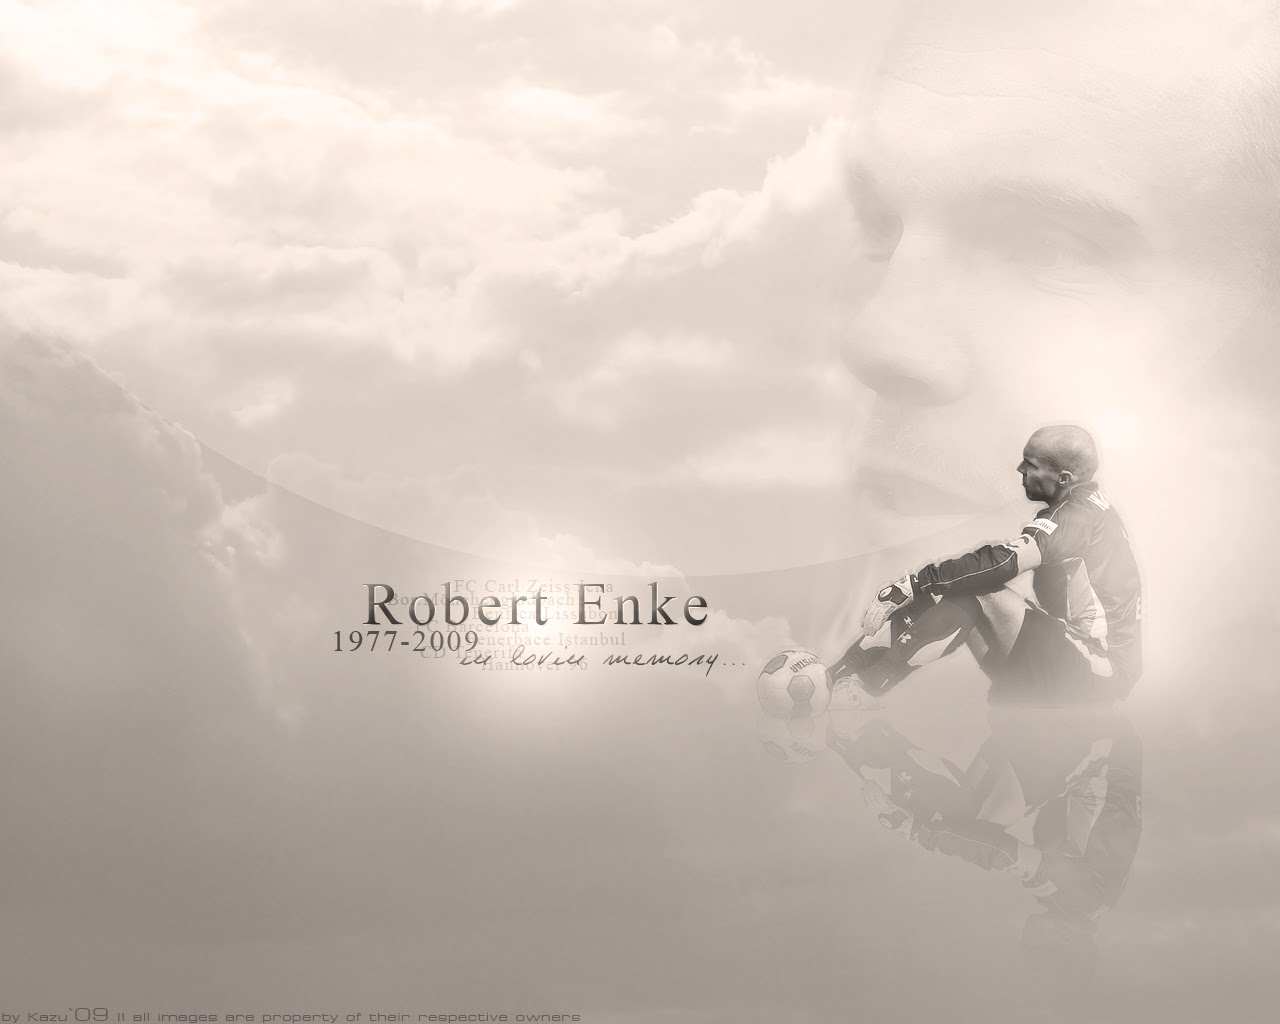 You Ll Never Walk Alone Robert Enke World Soccer Talk